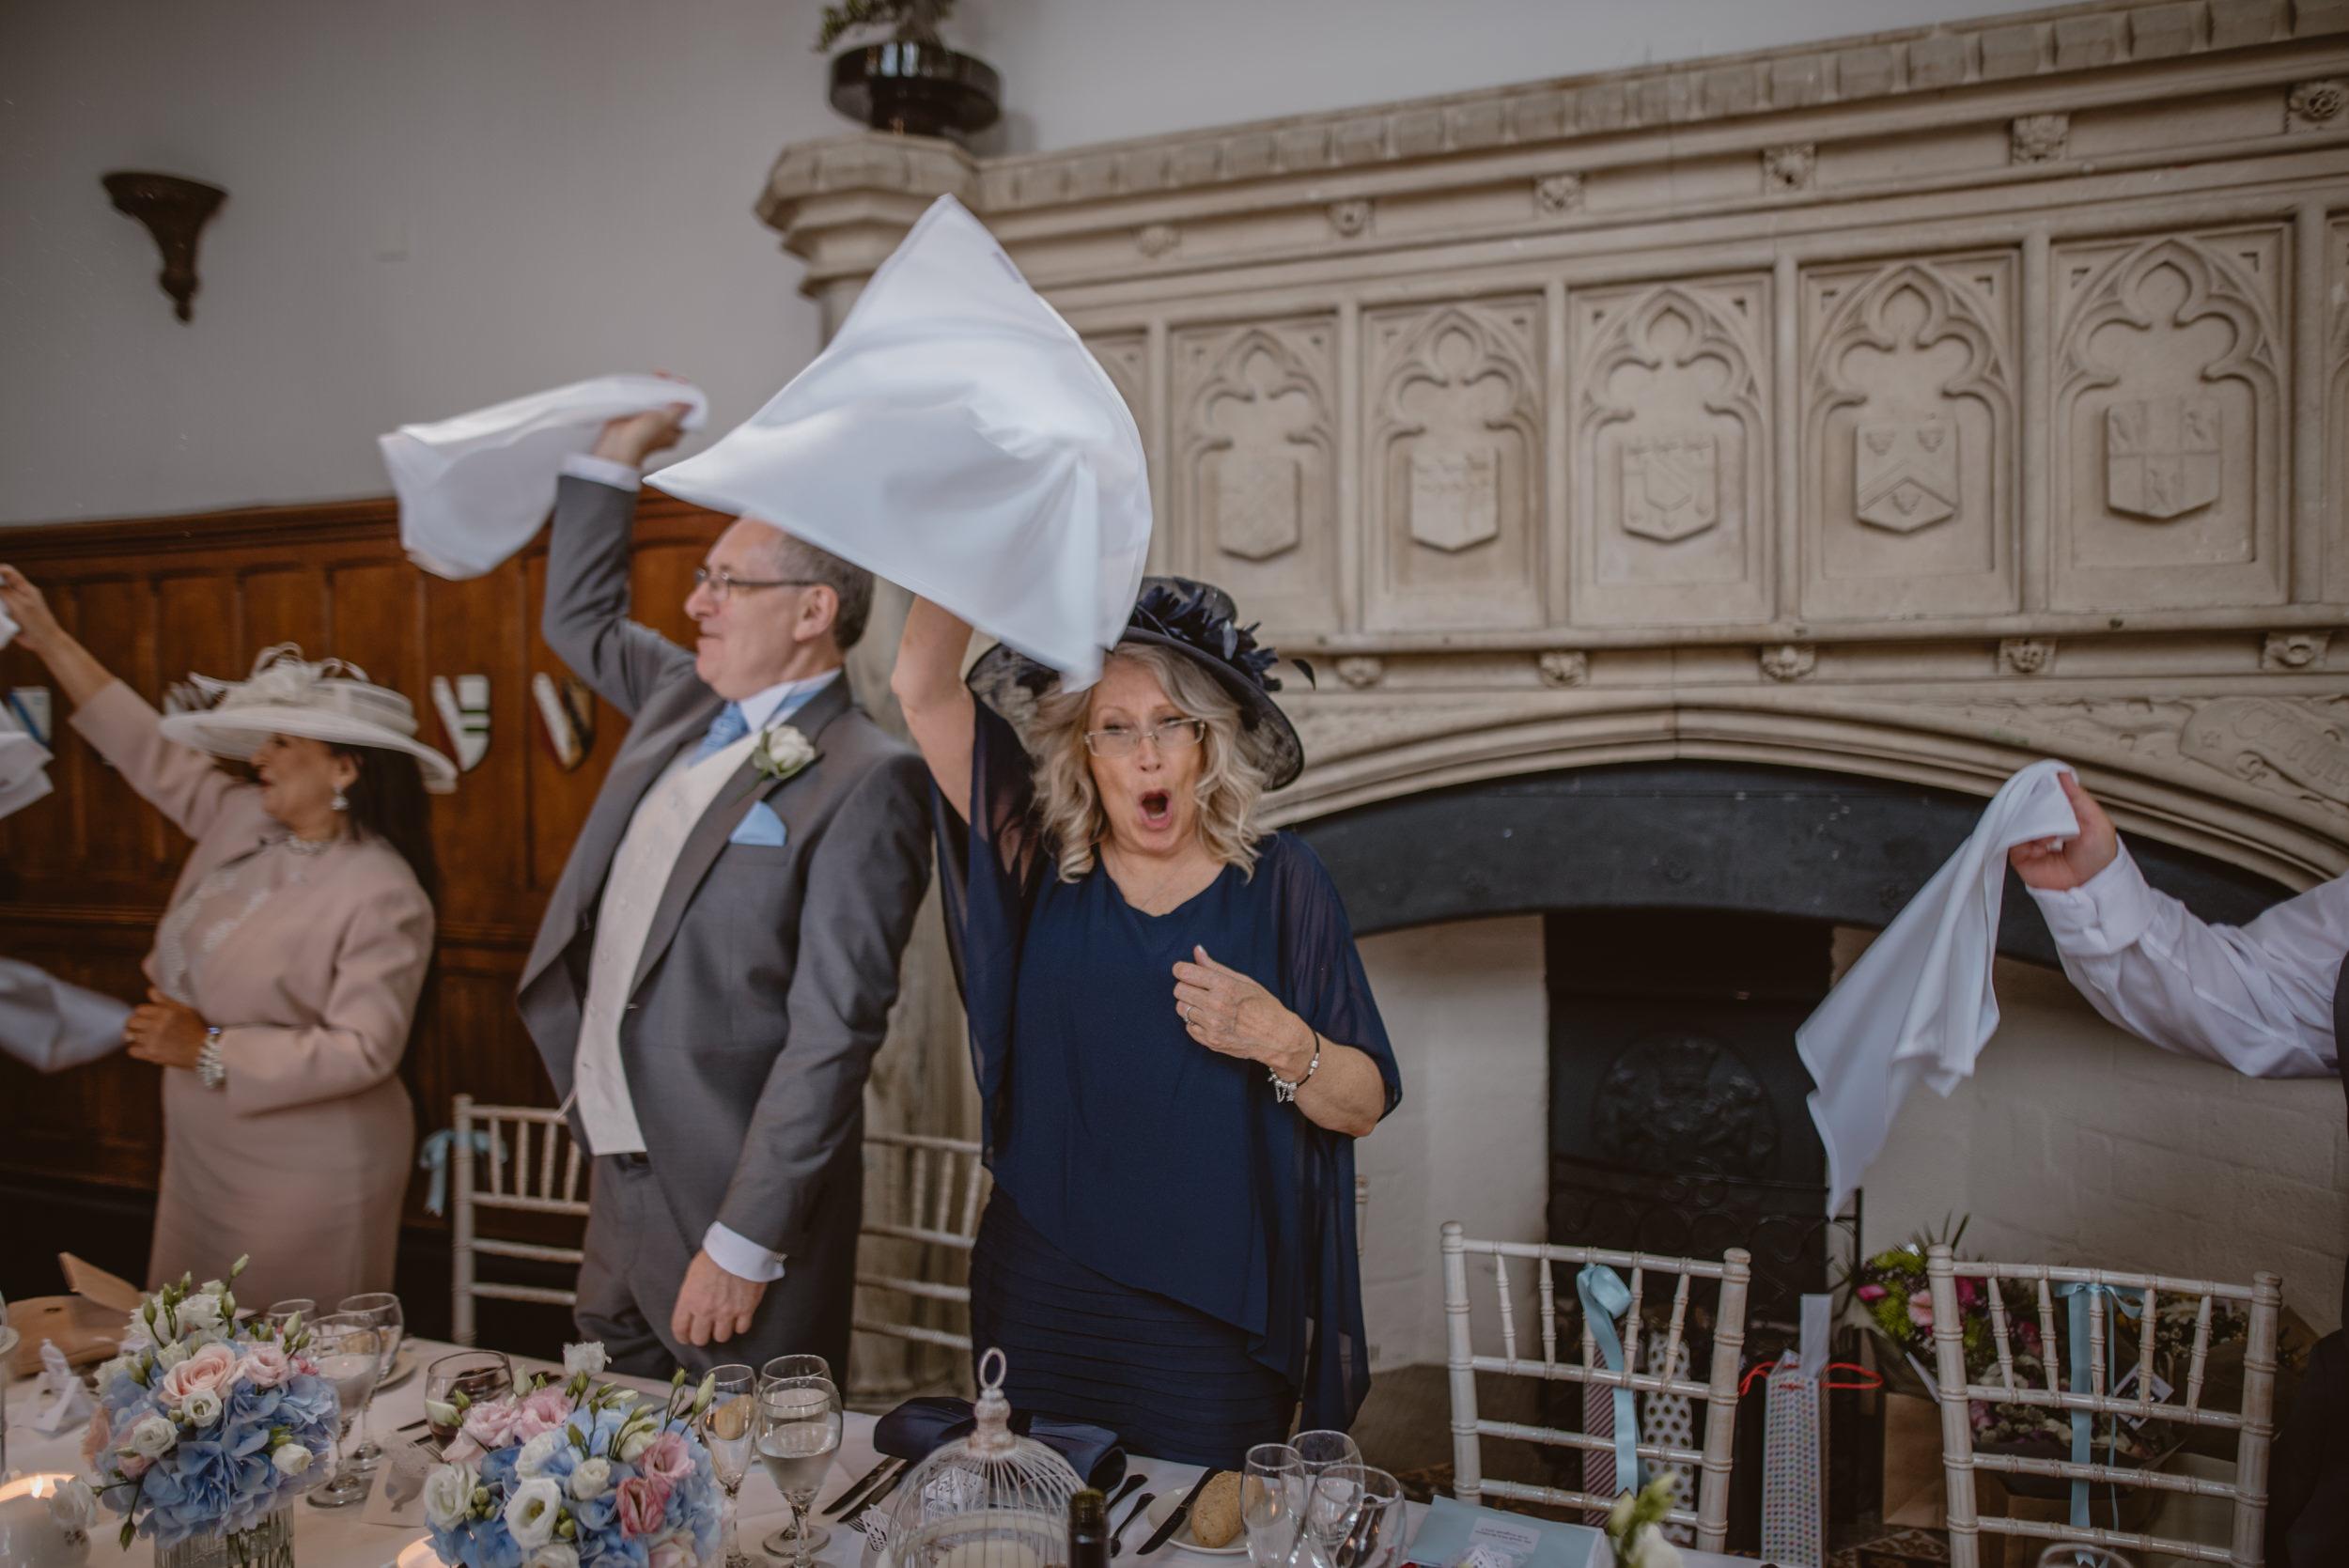 Rachel-and-James-Wedding-Horsley-Towers-State-Manu-Mendoza-Wedding-Photography-380.jpg